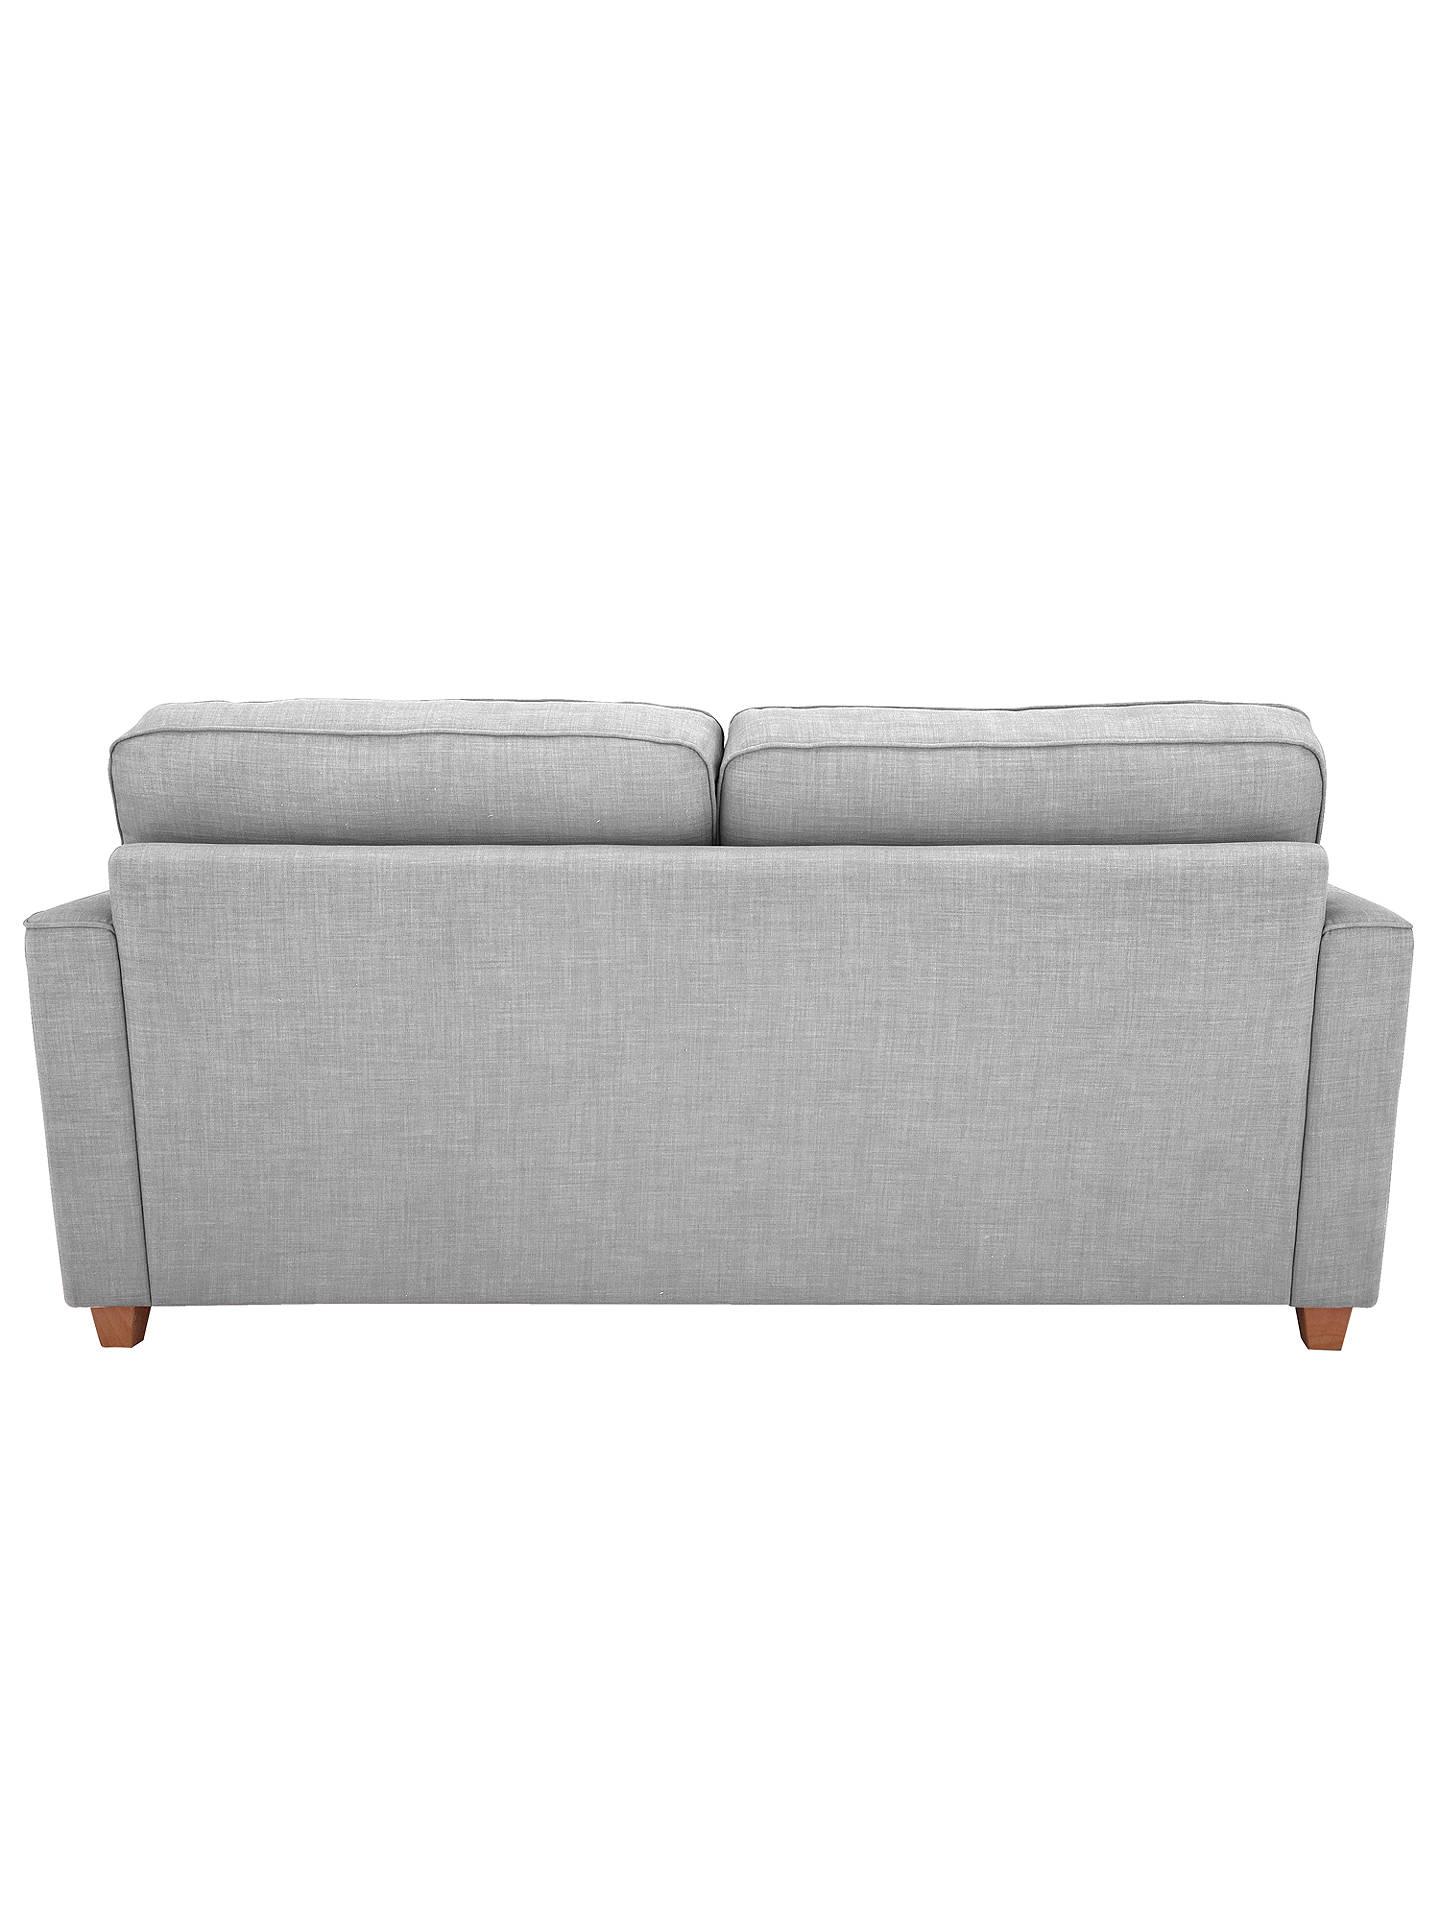 John Lewis Portia Medium Sofa Senna Charcoal At John Lewis Partners